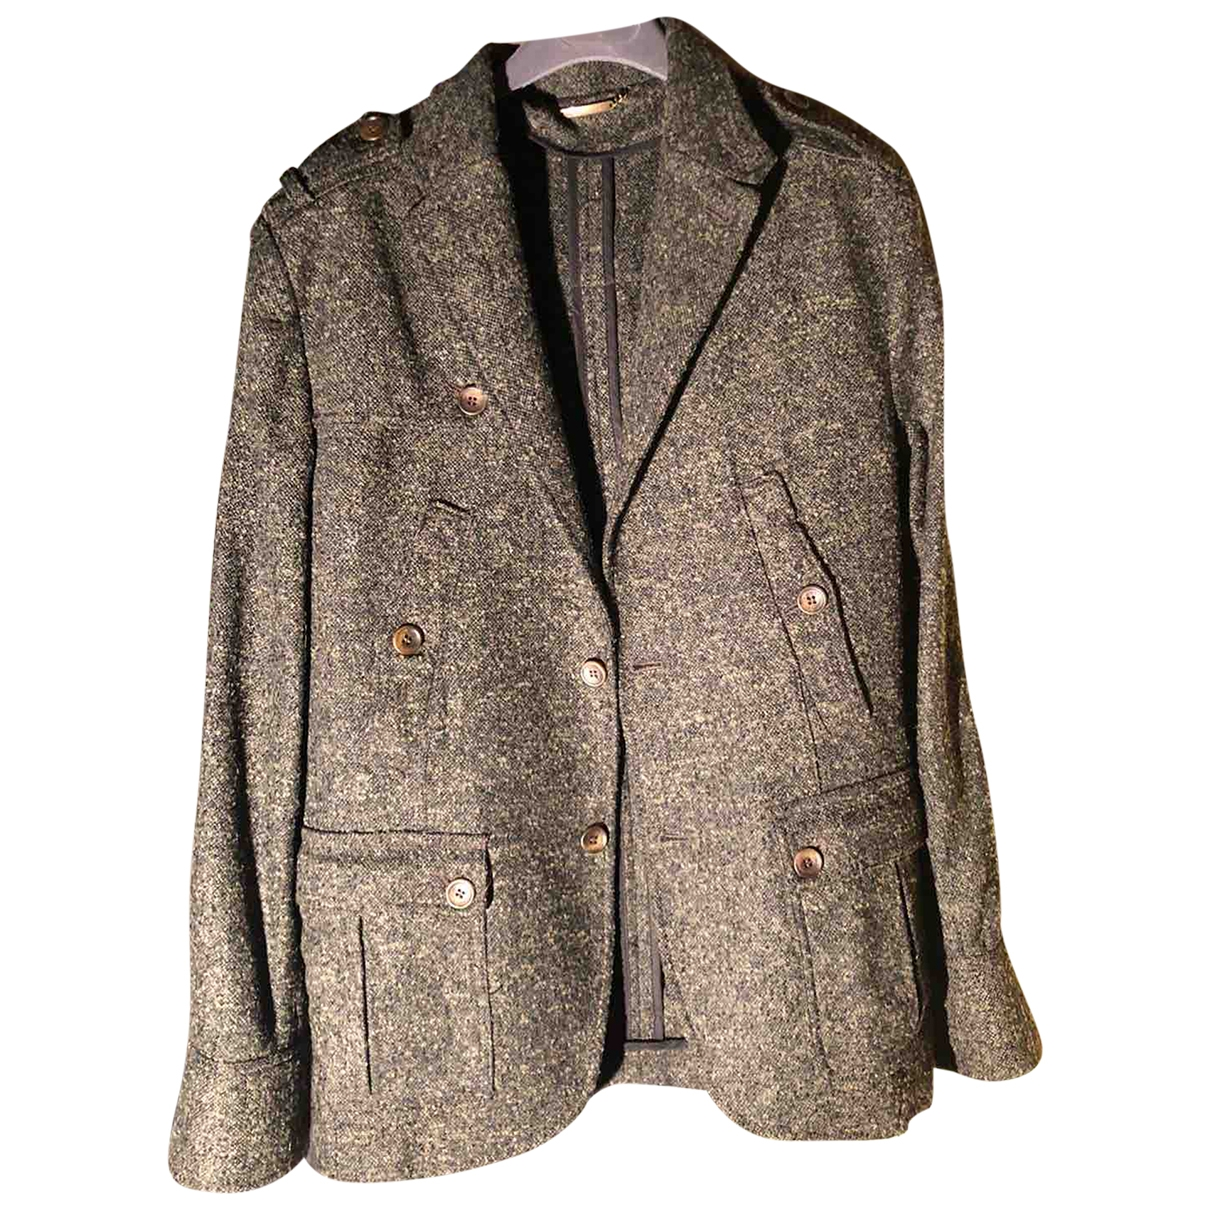 D&g \N Anthracite Wool coat  for Men 52 IT